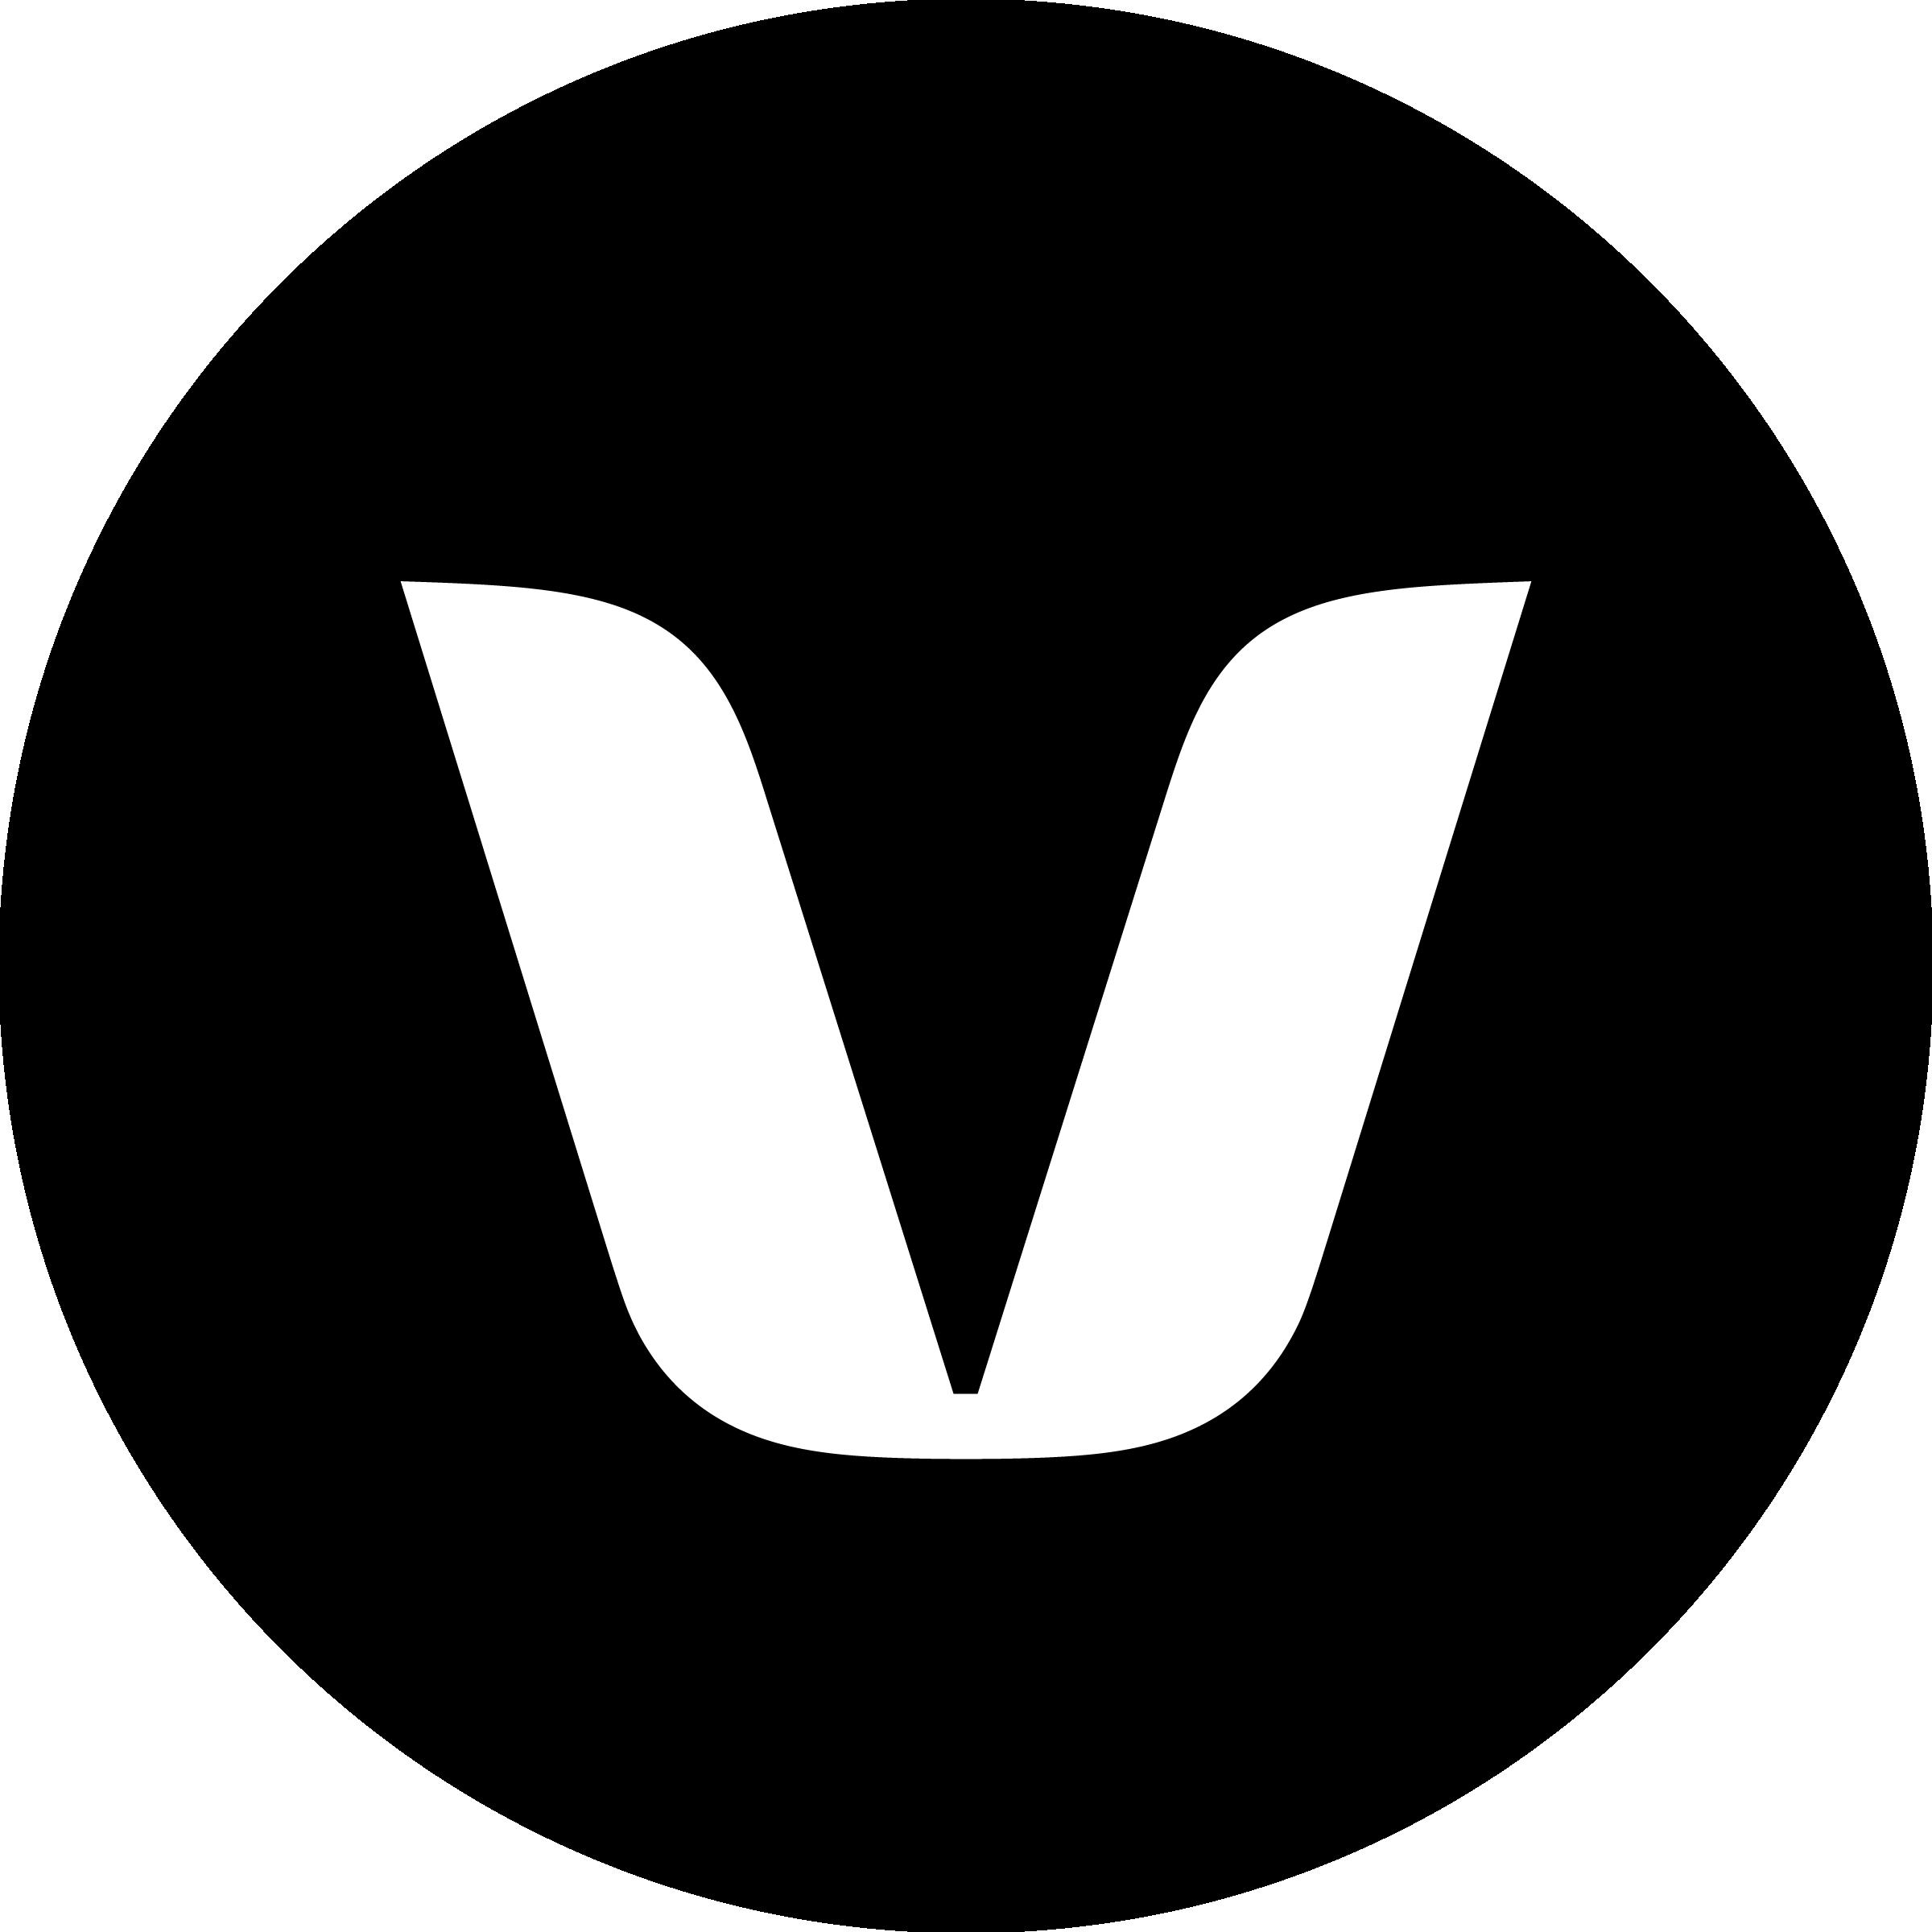 Vent Finance logo